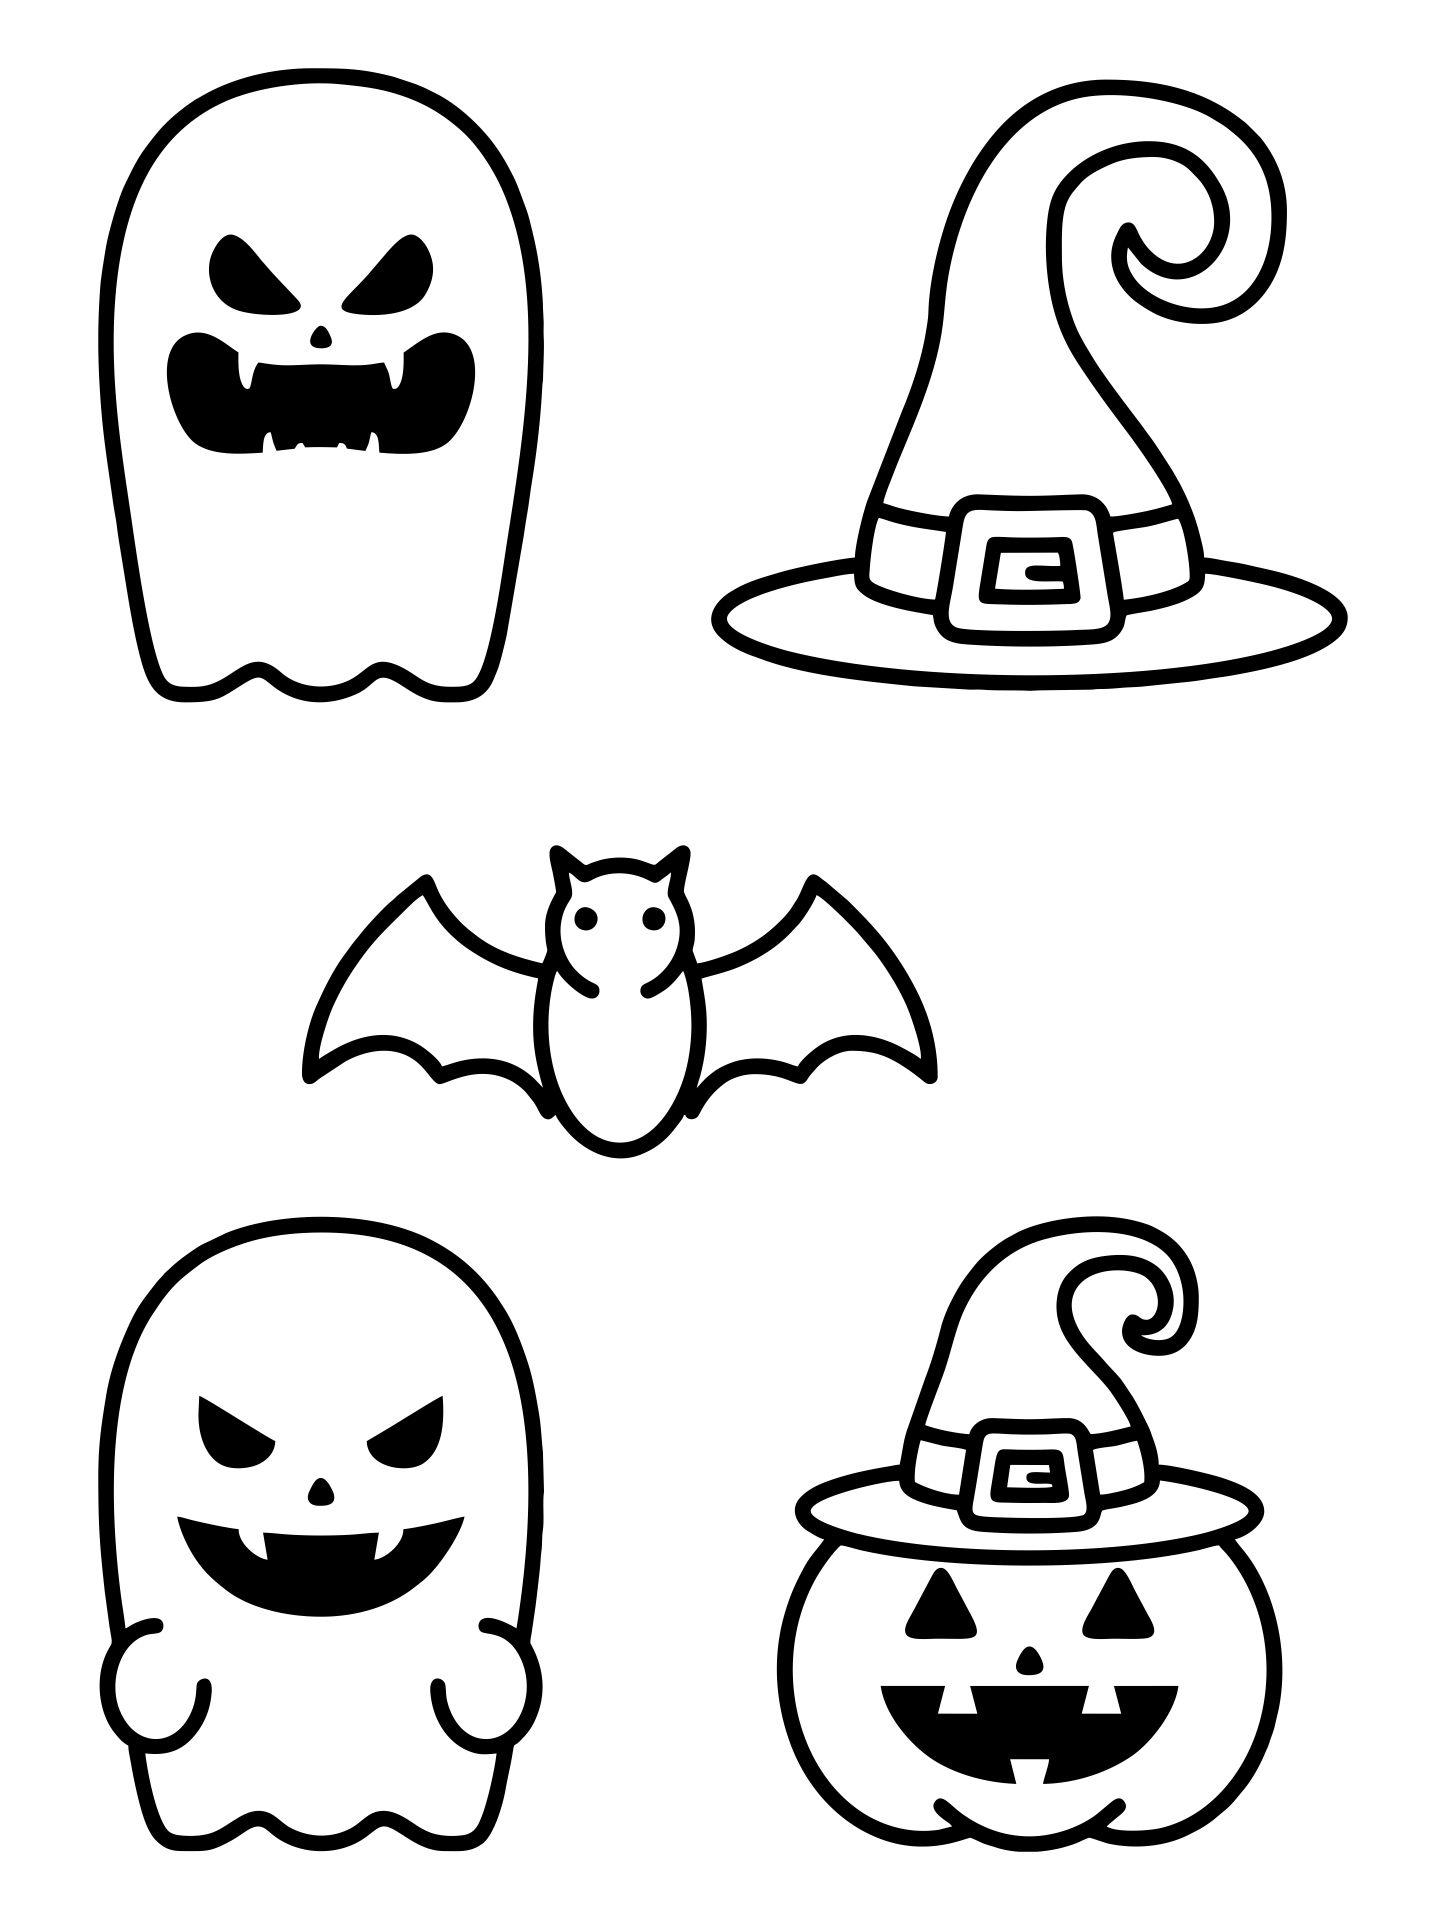 Printable Halloween Stencils for Kids